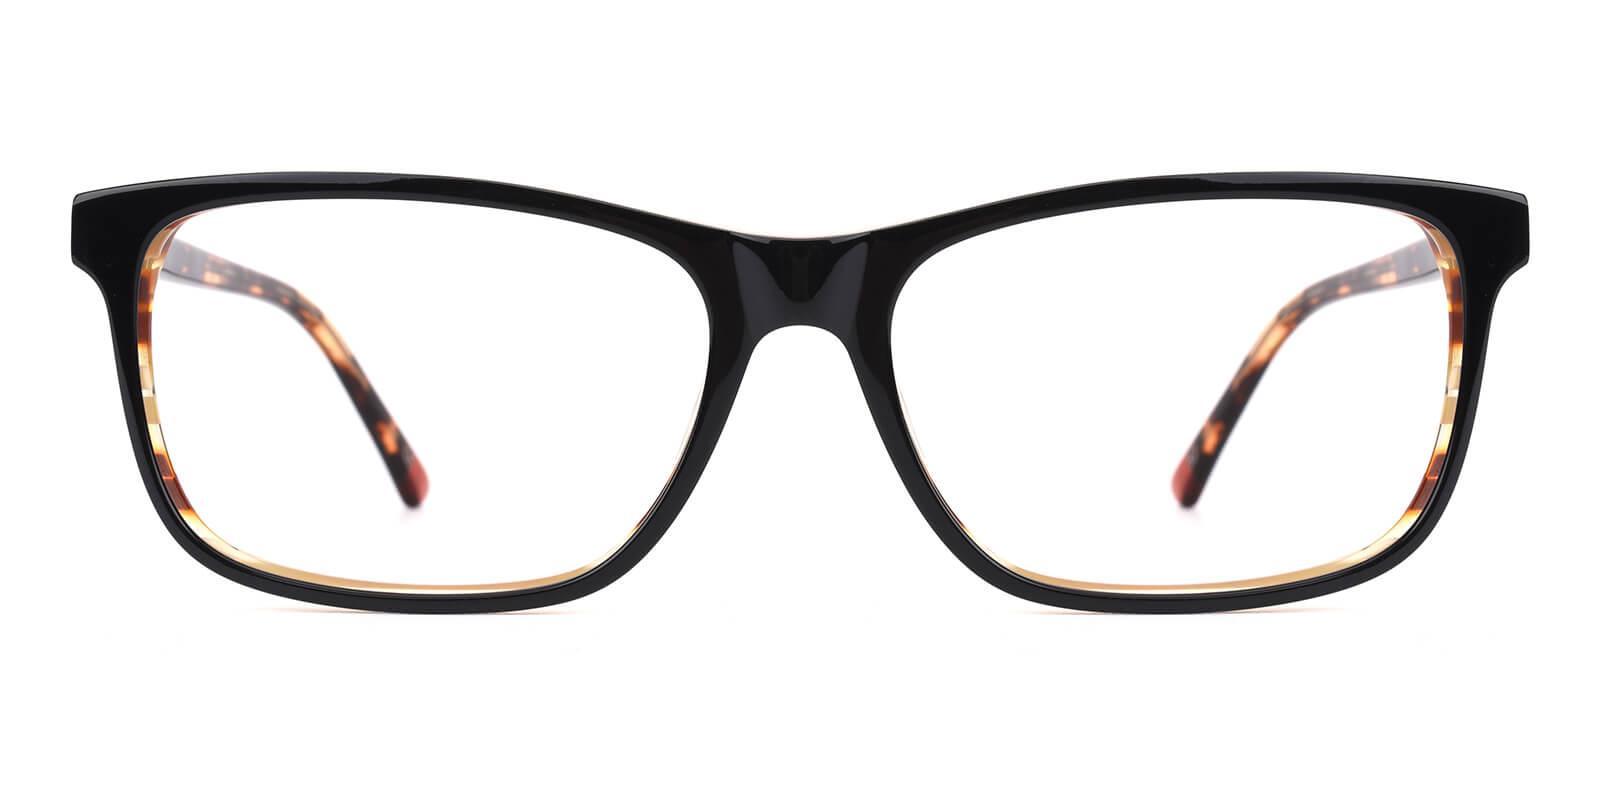 Chief-Tortoise-Rectangle-Acetate-Eyeglasses-additional2